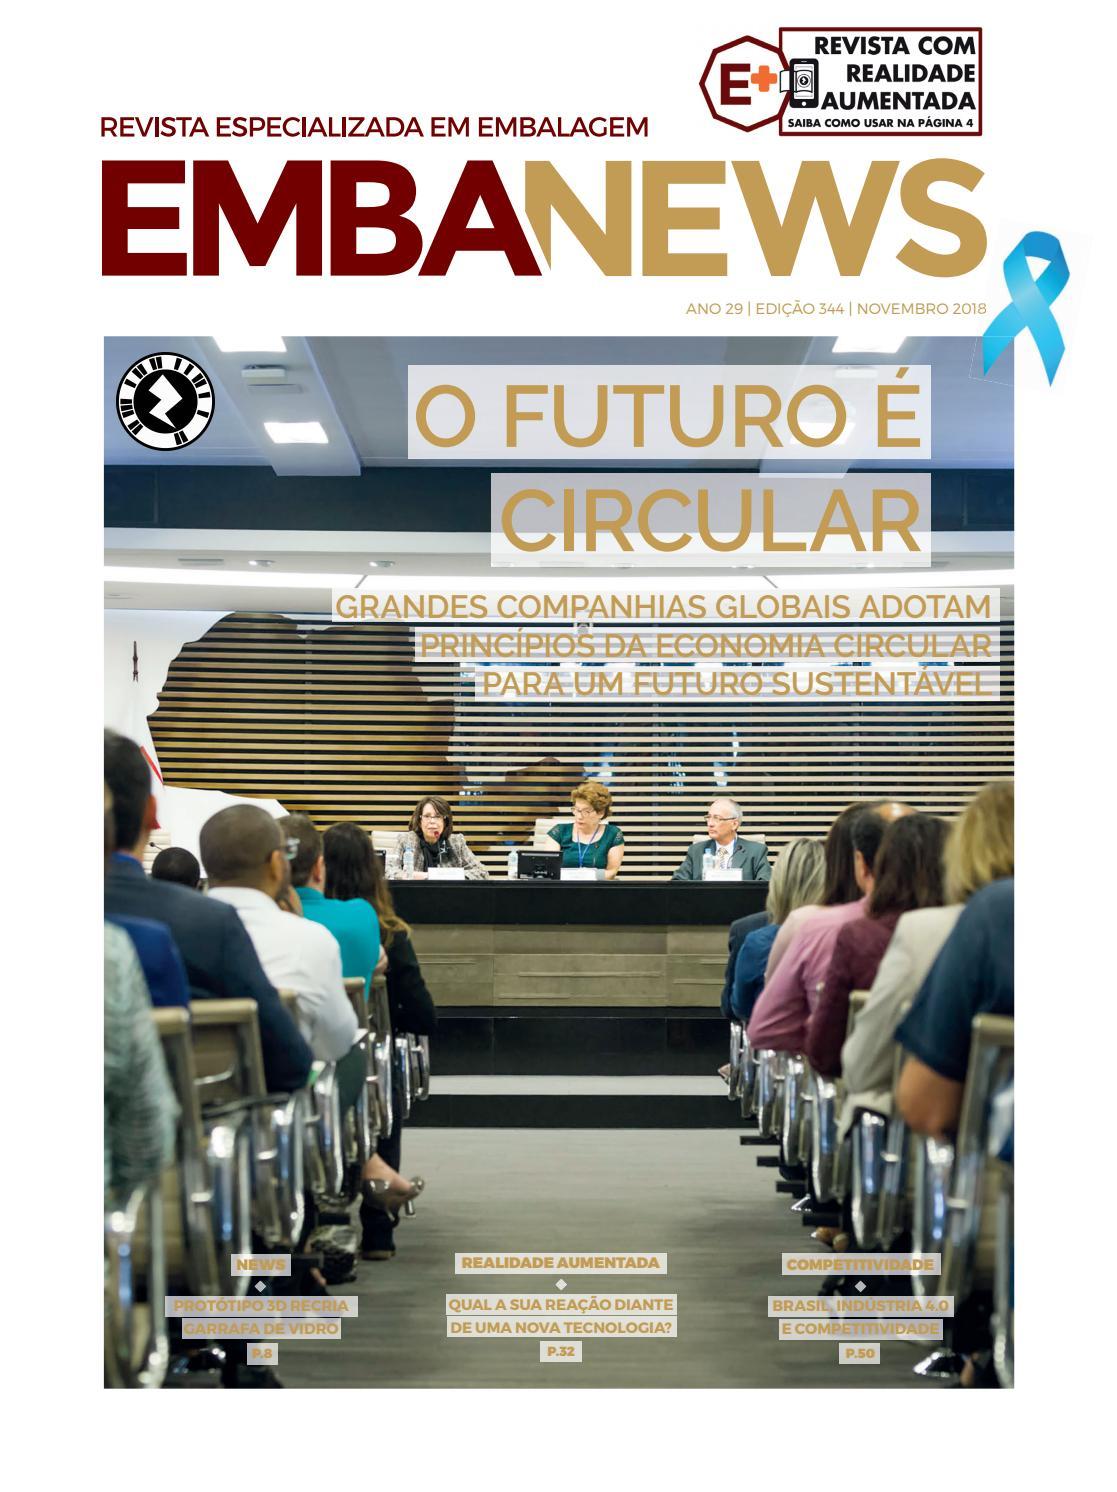 159b2b499 EMBANEWS Nº 344 - Novembro 2018 by EMBANEWS - issuu